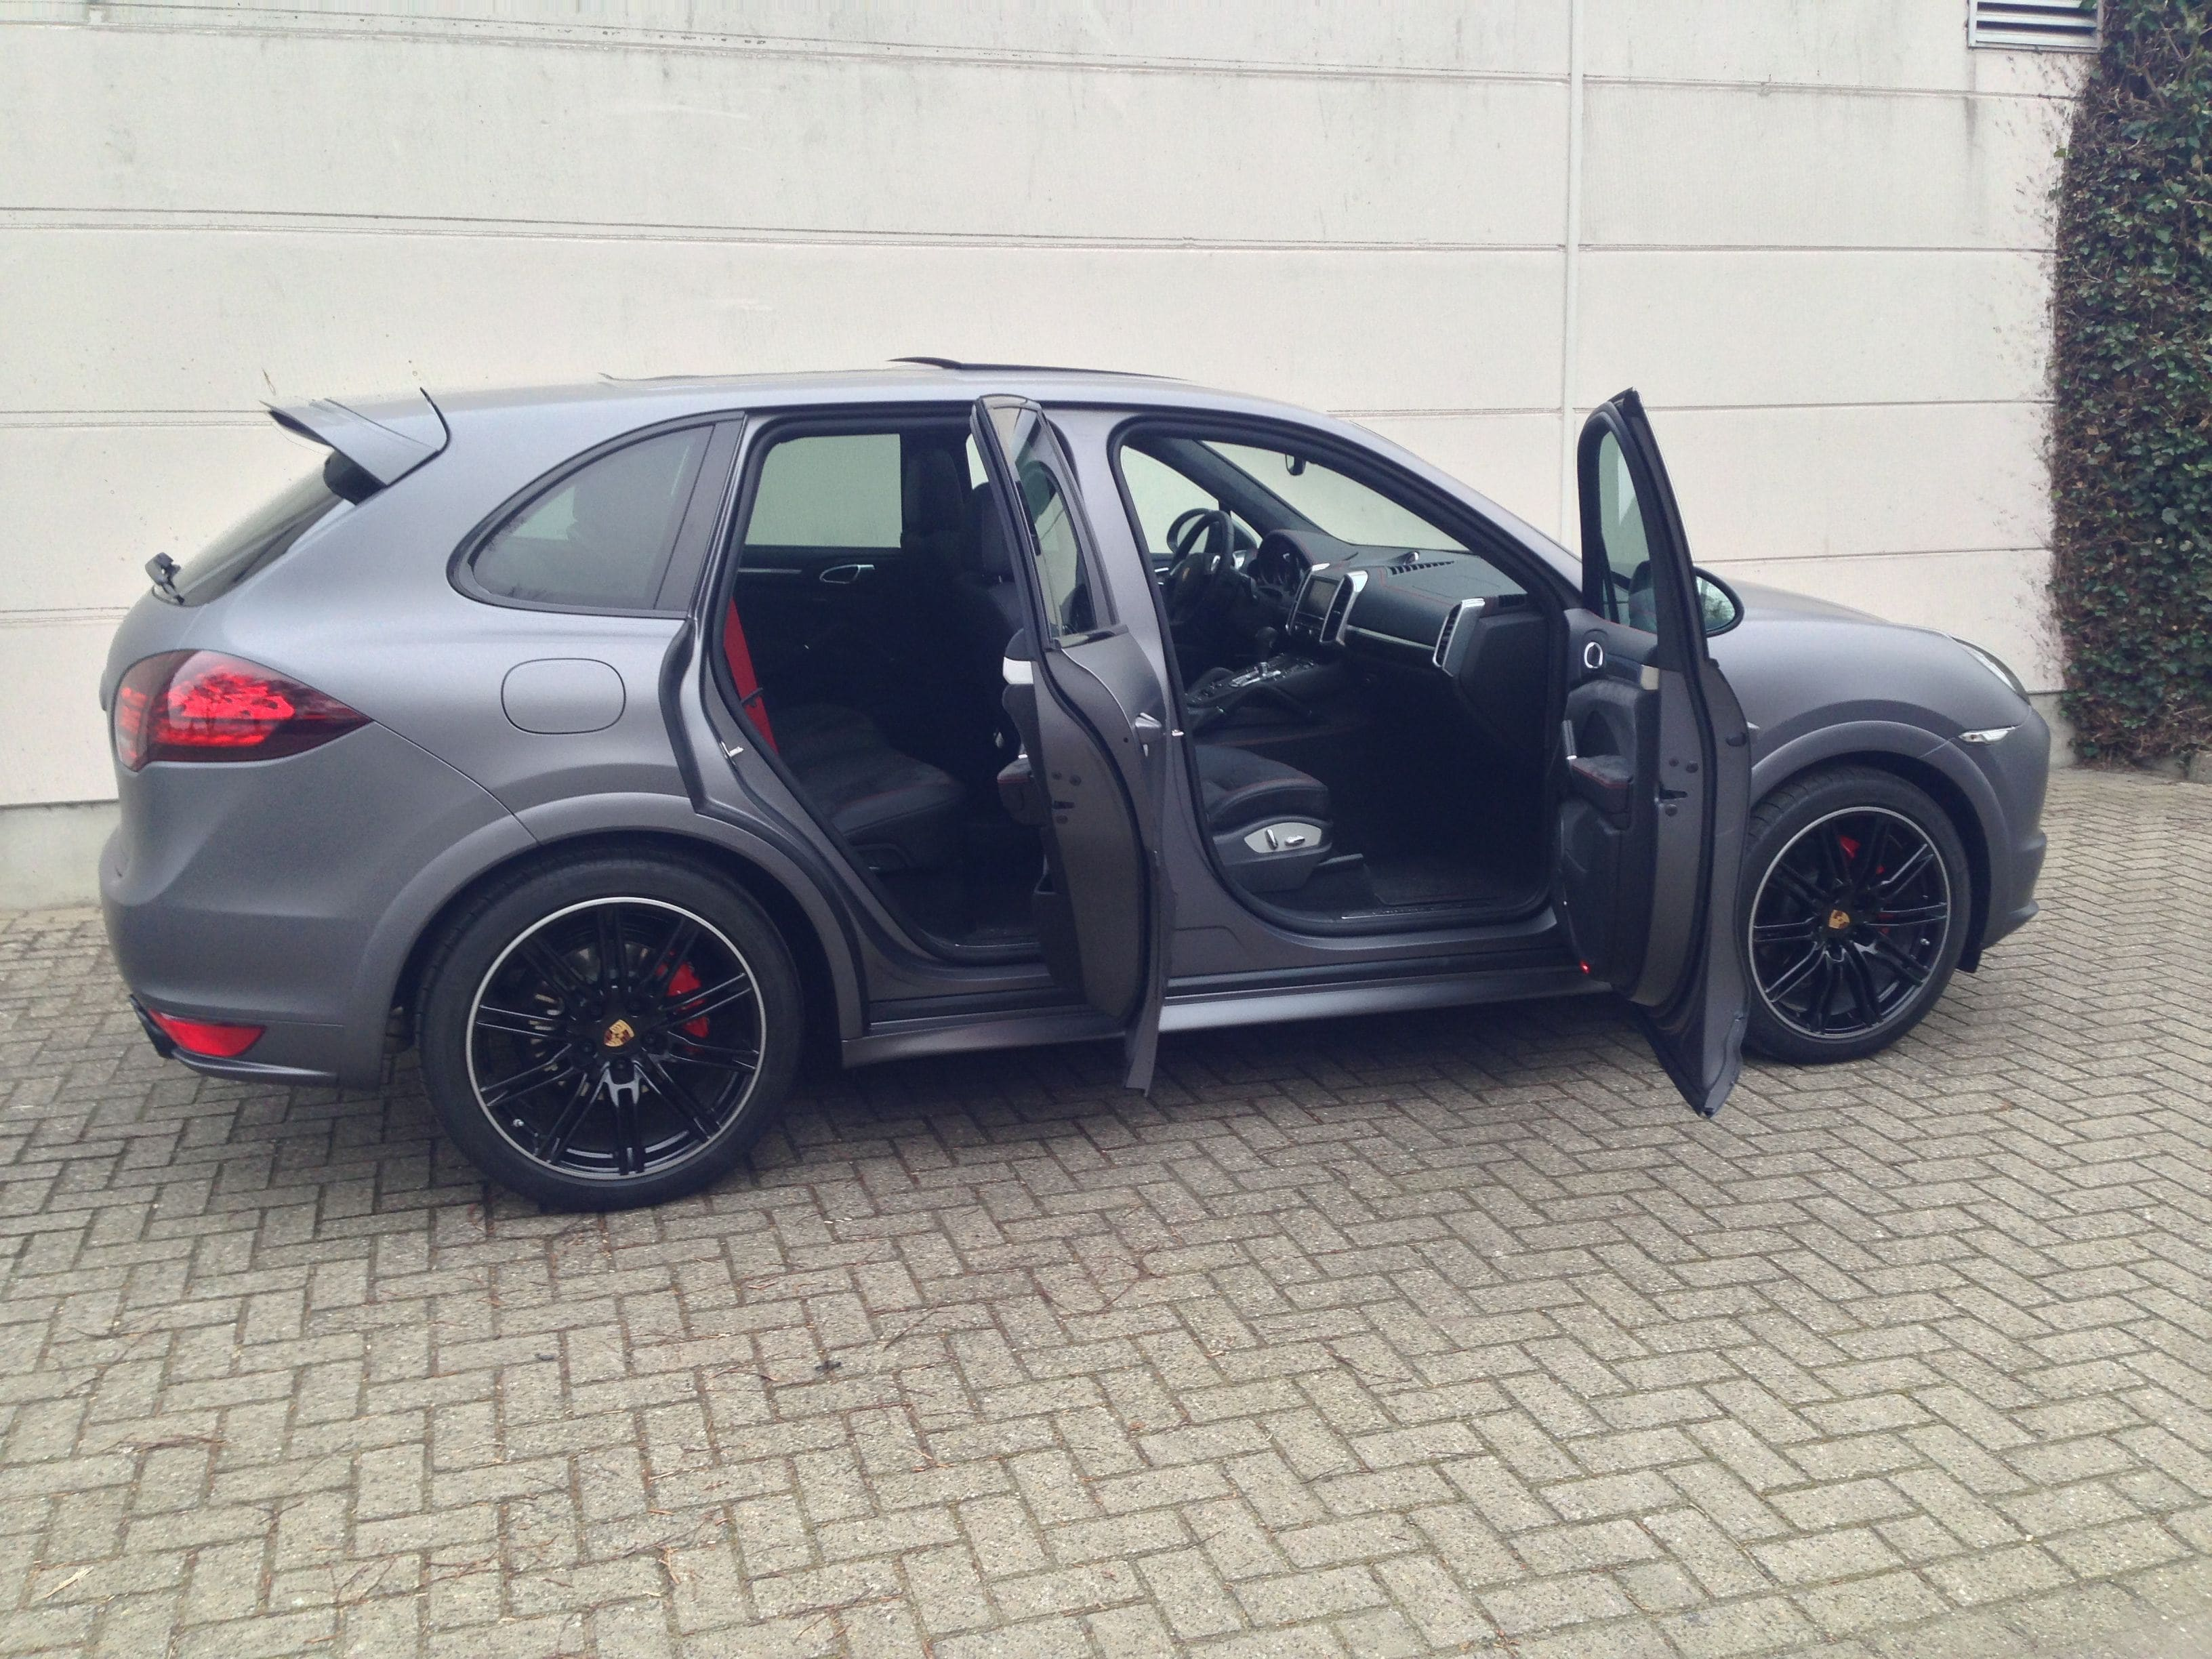 Porsche Cayenne GTS met Gunpowder Wrap, Carwrapping door Wrapmyride.nu Foto-nr:6788, ©2021